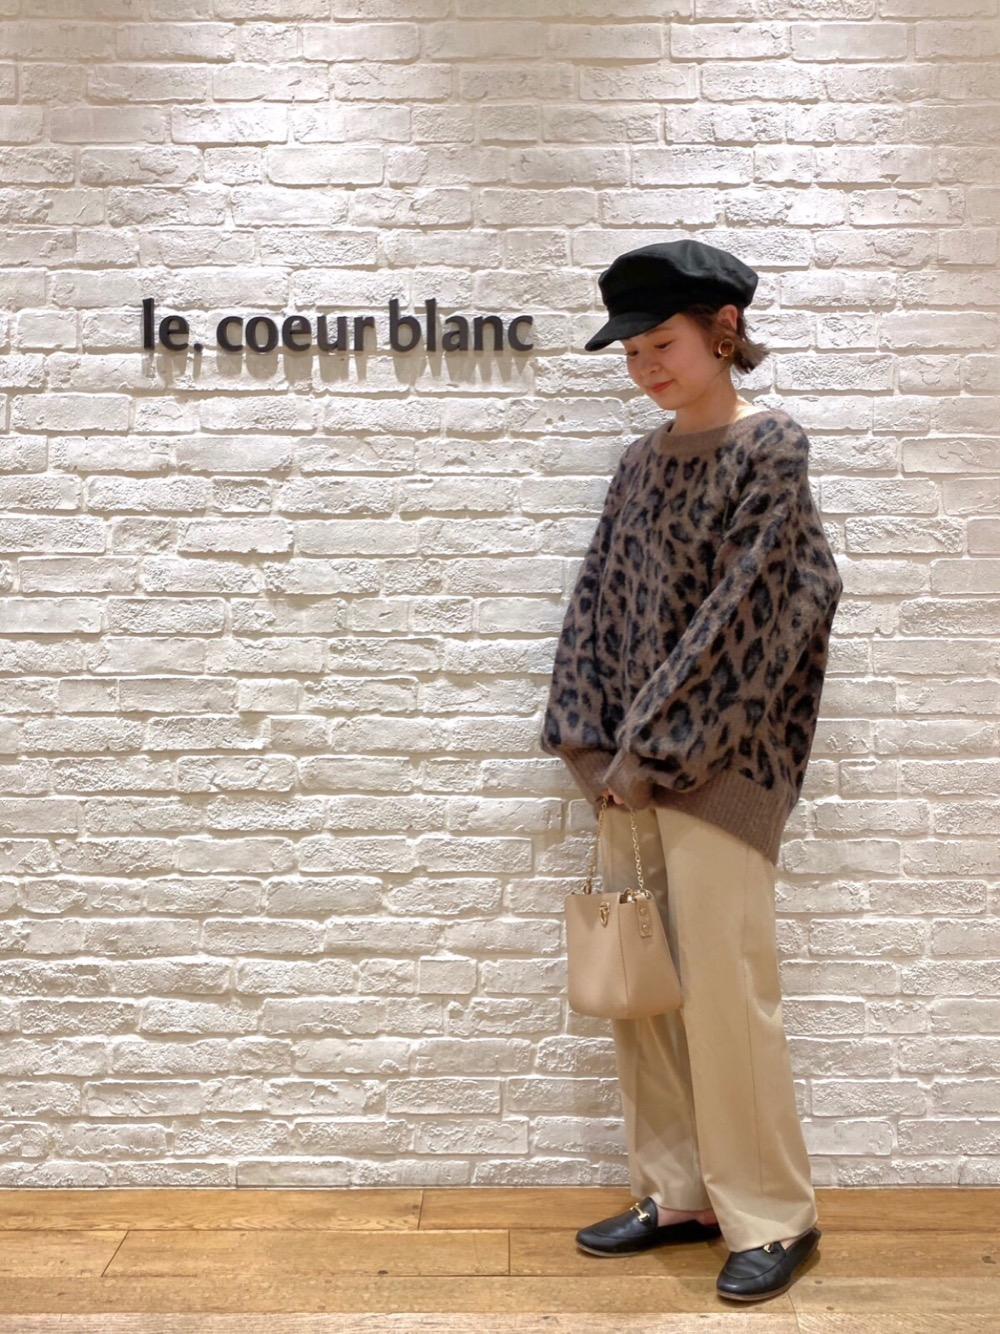 le.coeur blanc京急ショッピングプラザウィング高輪店